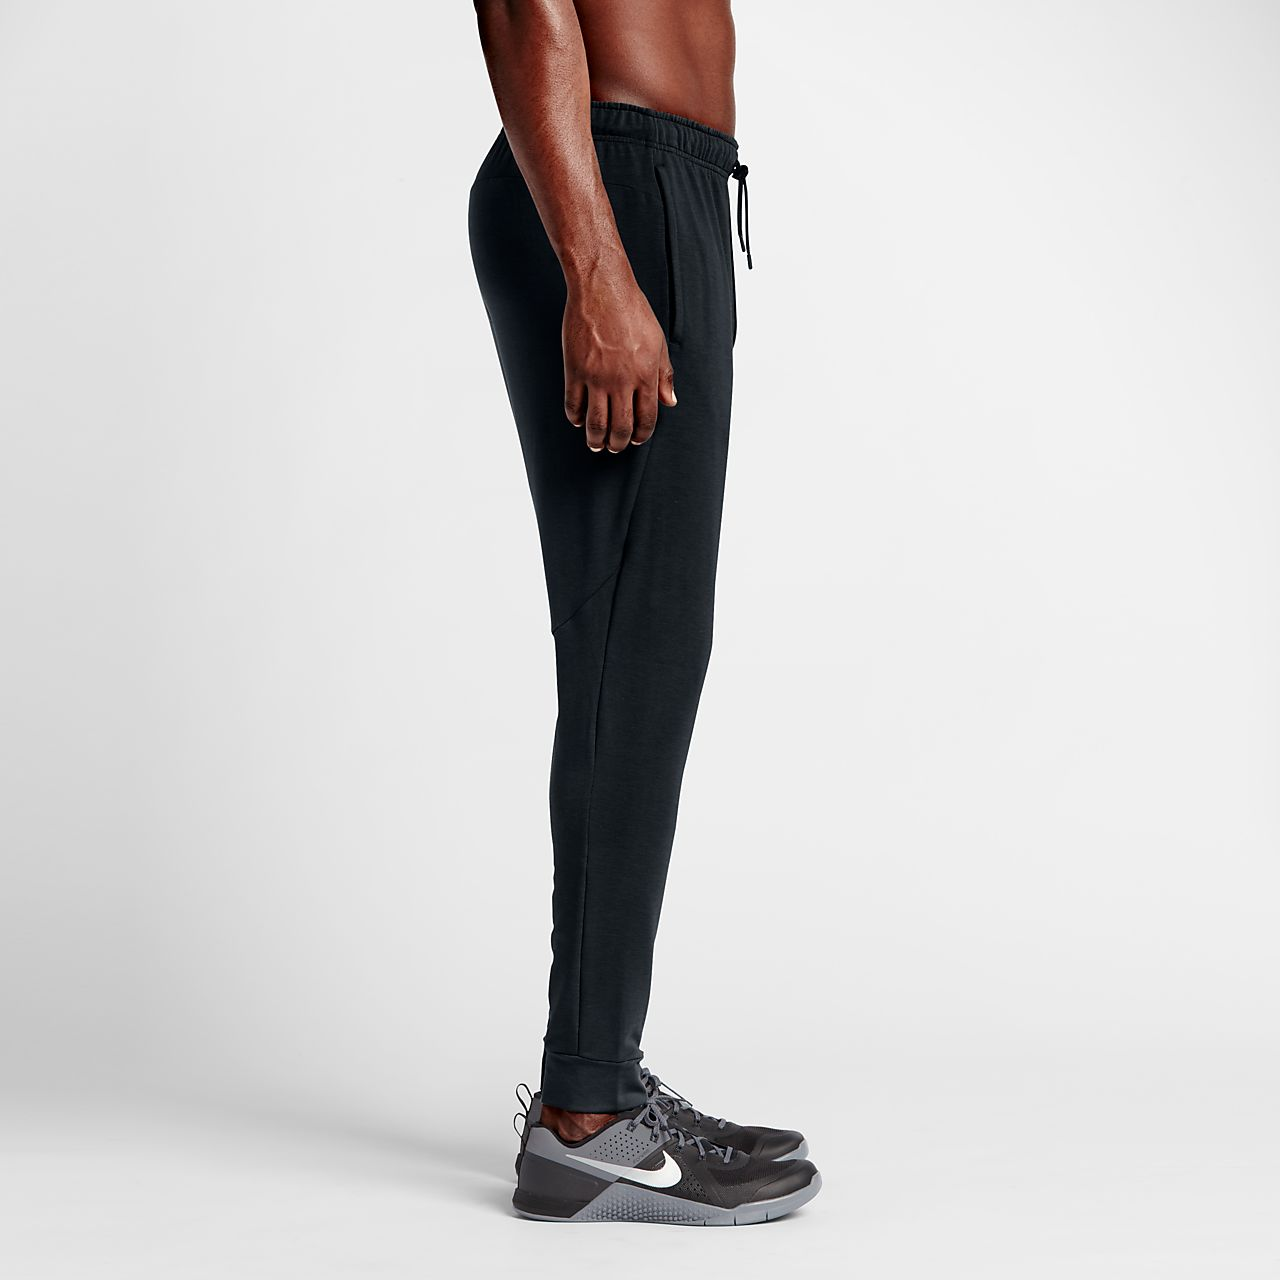 3996841cbb8fc6 Nike Dri-FIT Fleece-Trainingshose für Herren. Nike.com DE